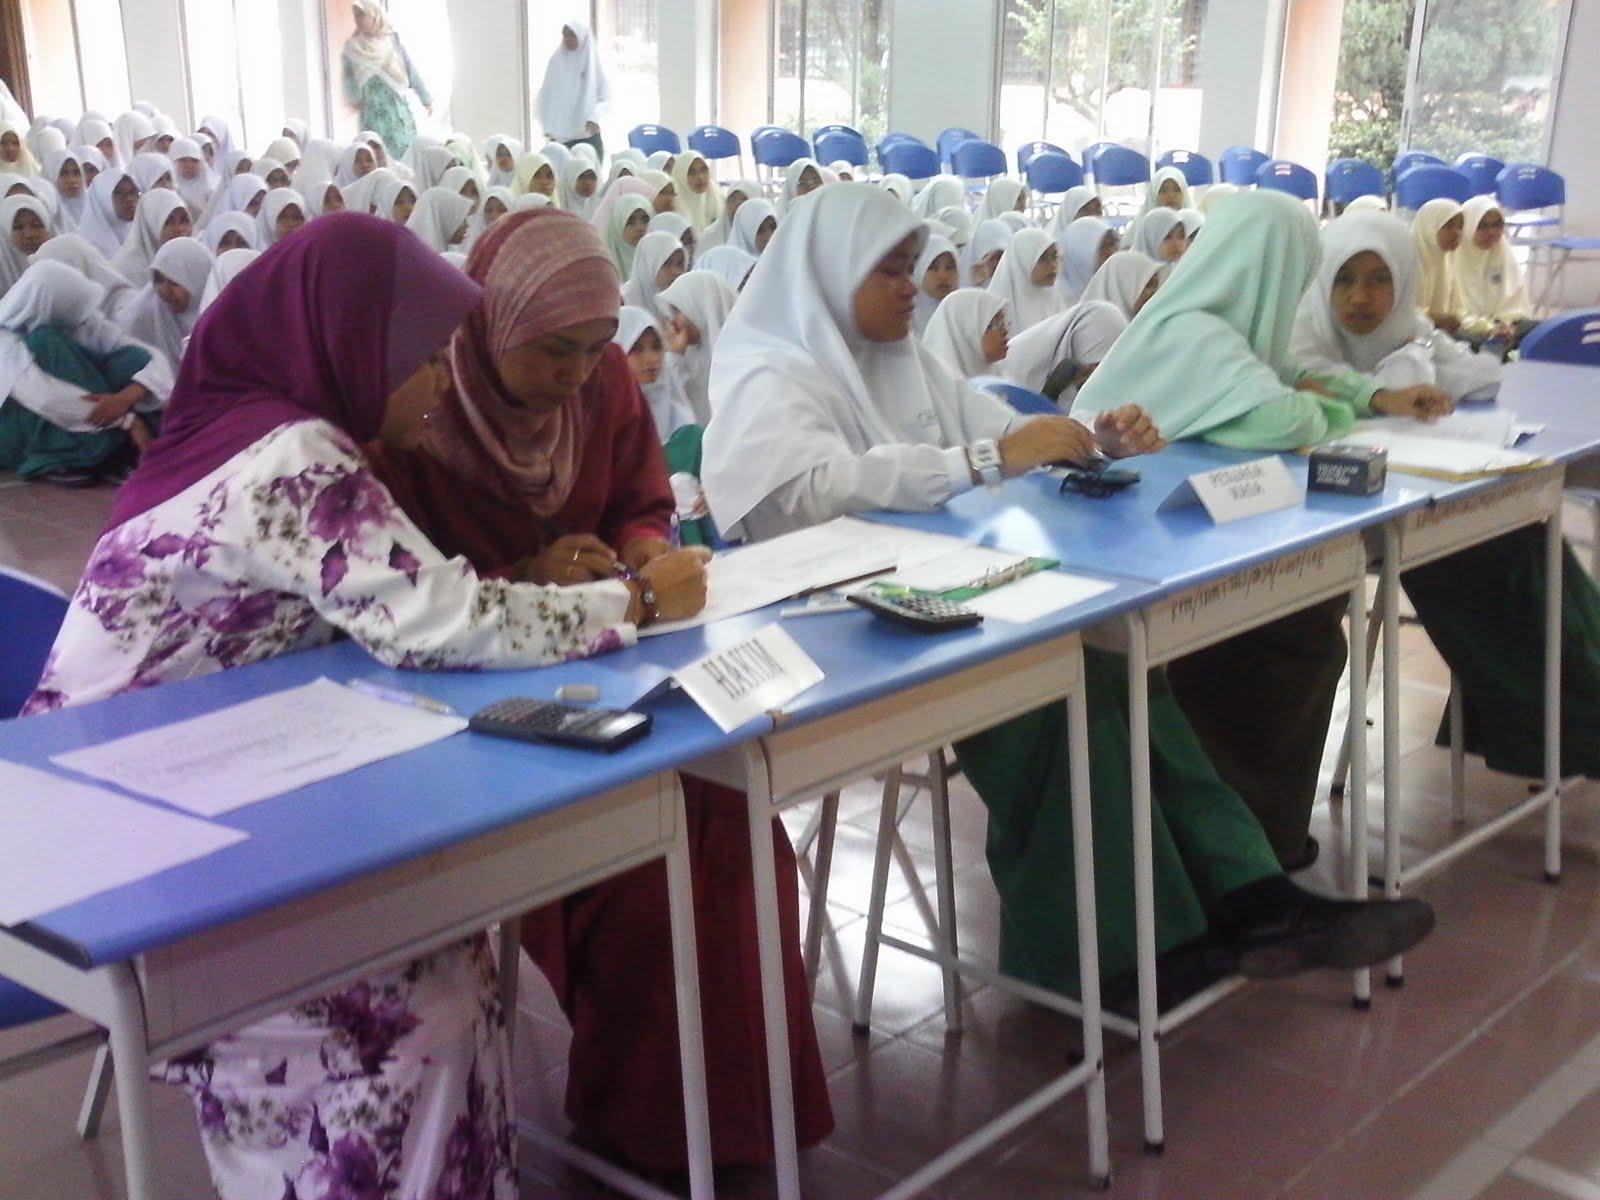 Ppt Sekolah Menengah Ibn Khaldun Jalan Kebun Shah Alam Powerpoint Presentation Id 3168101